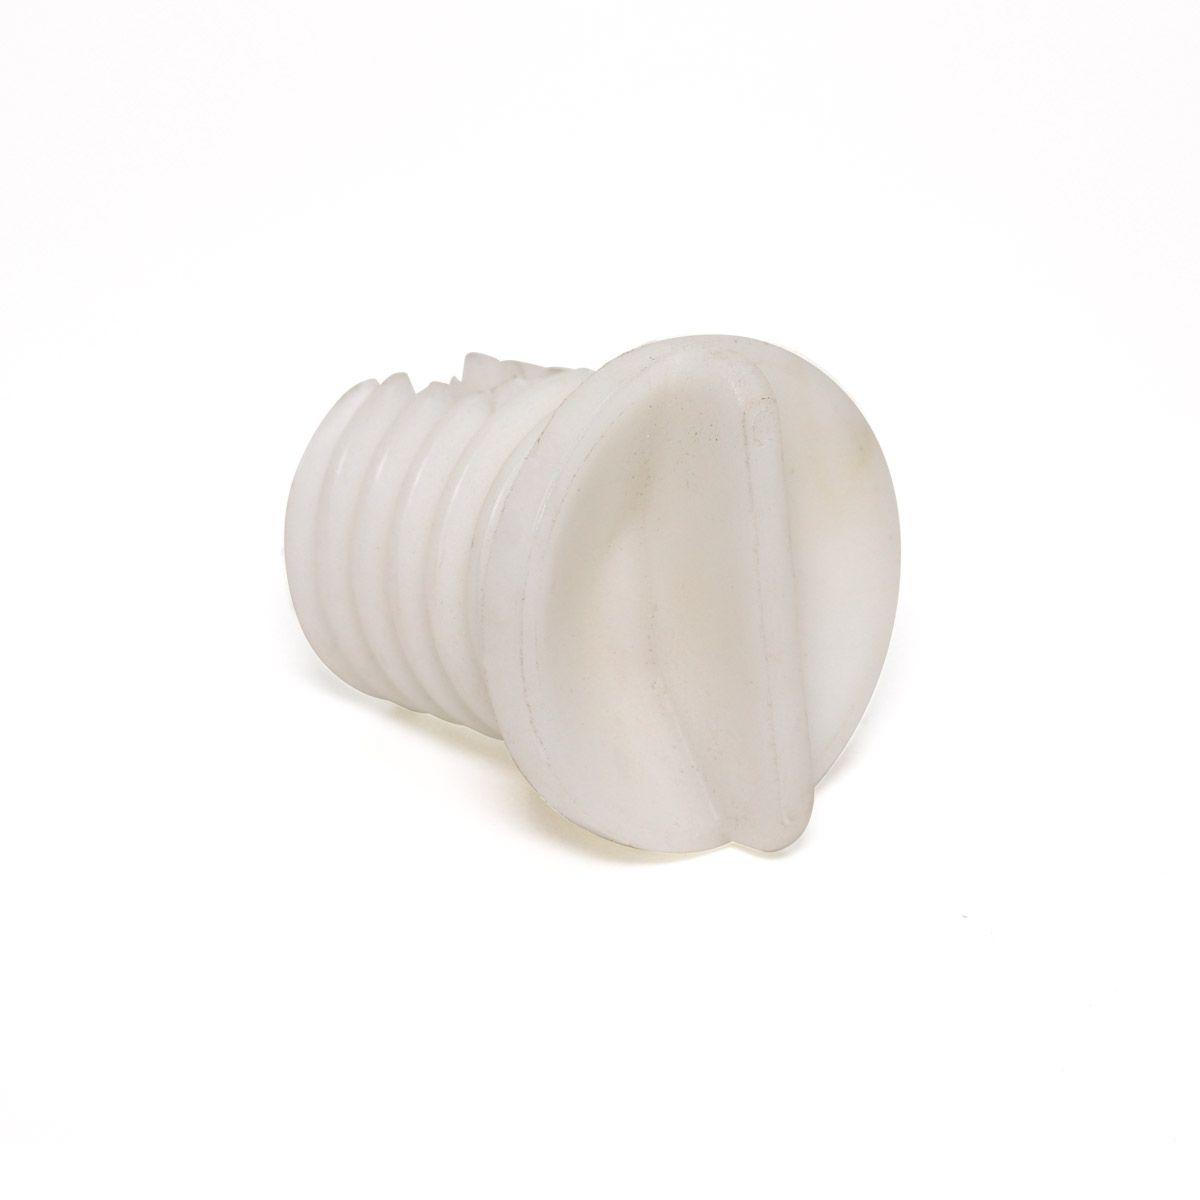 Tampa Com Rosca Polipropileno + Talco Para Caixas Plásticas